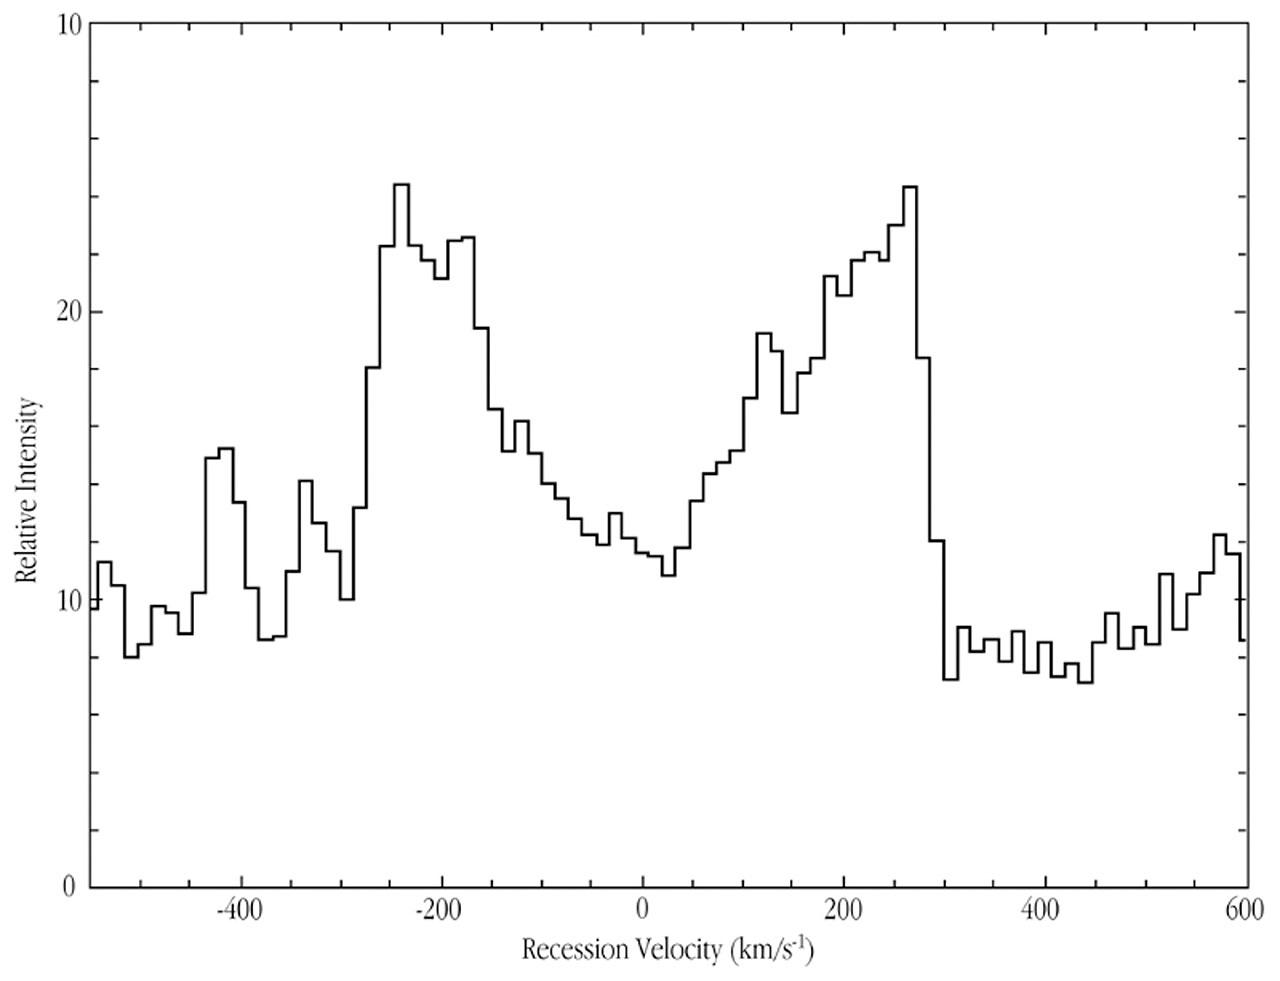 H-alpha Profile of Spiral Galaxy ISOHDF 27